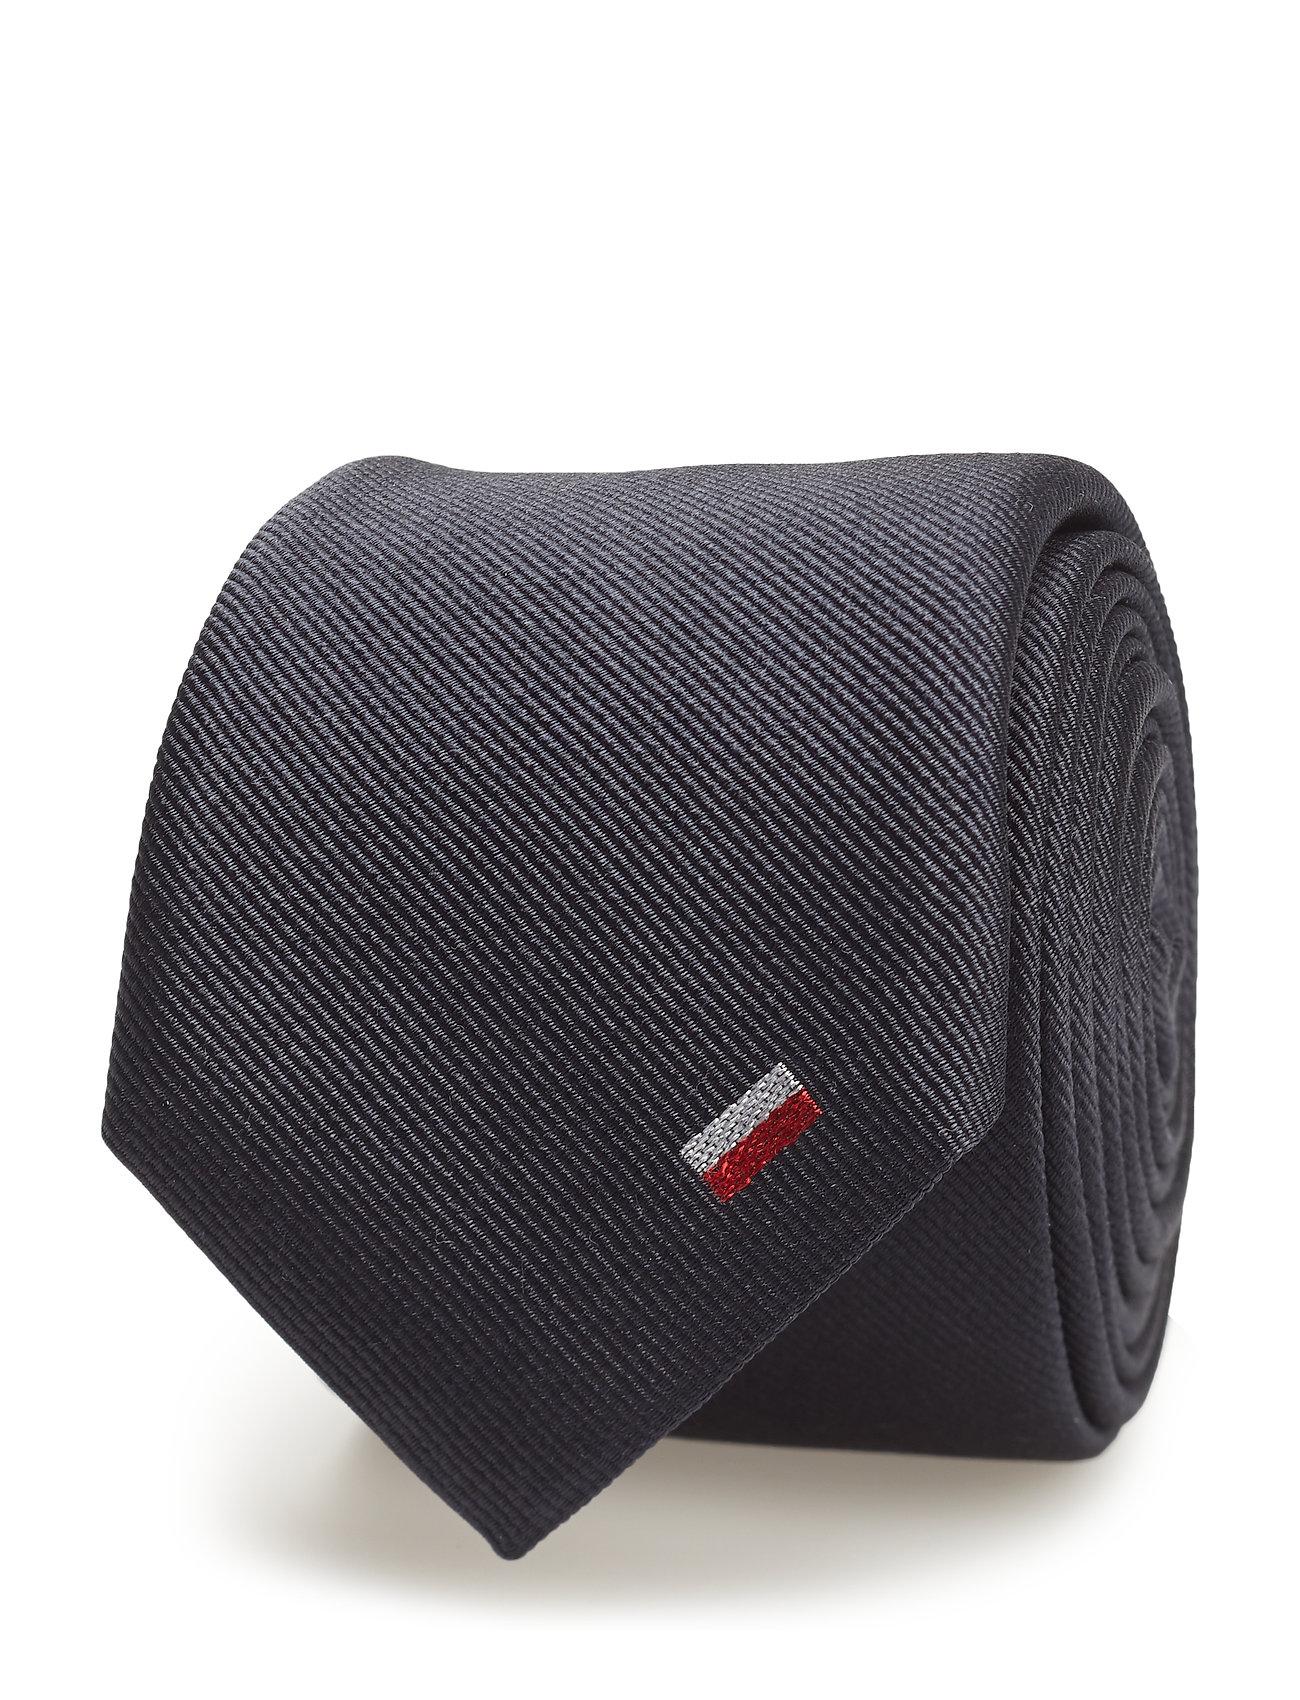 Image of Tie 6 Cm Slips Blå BOSS Business Wear (3333155125)